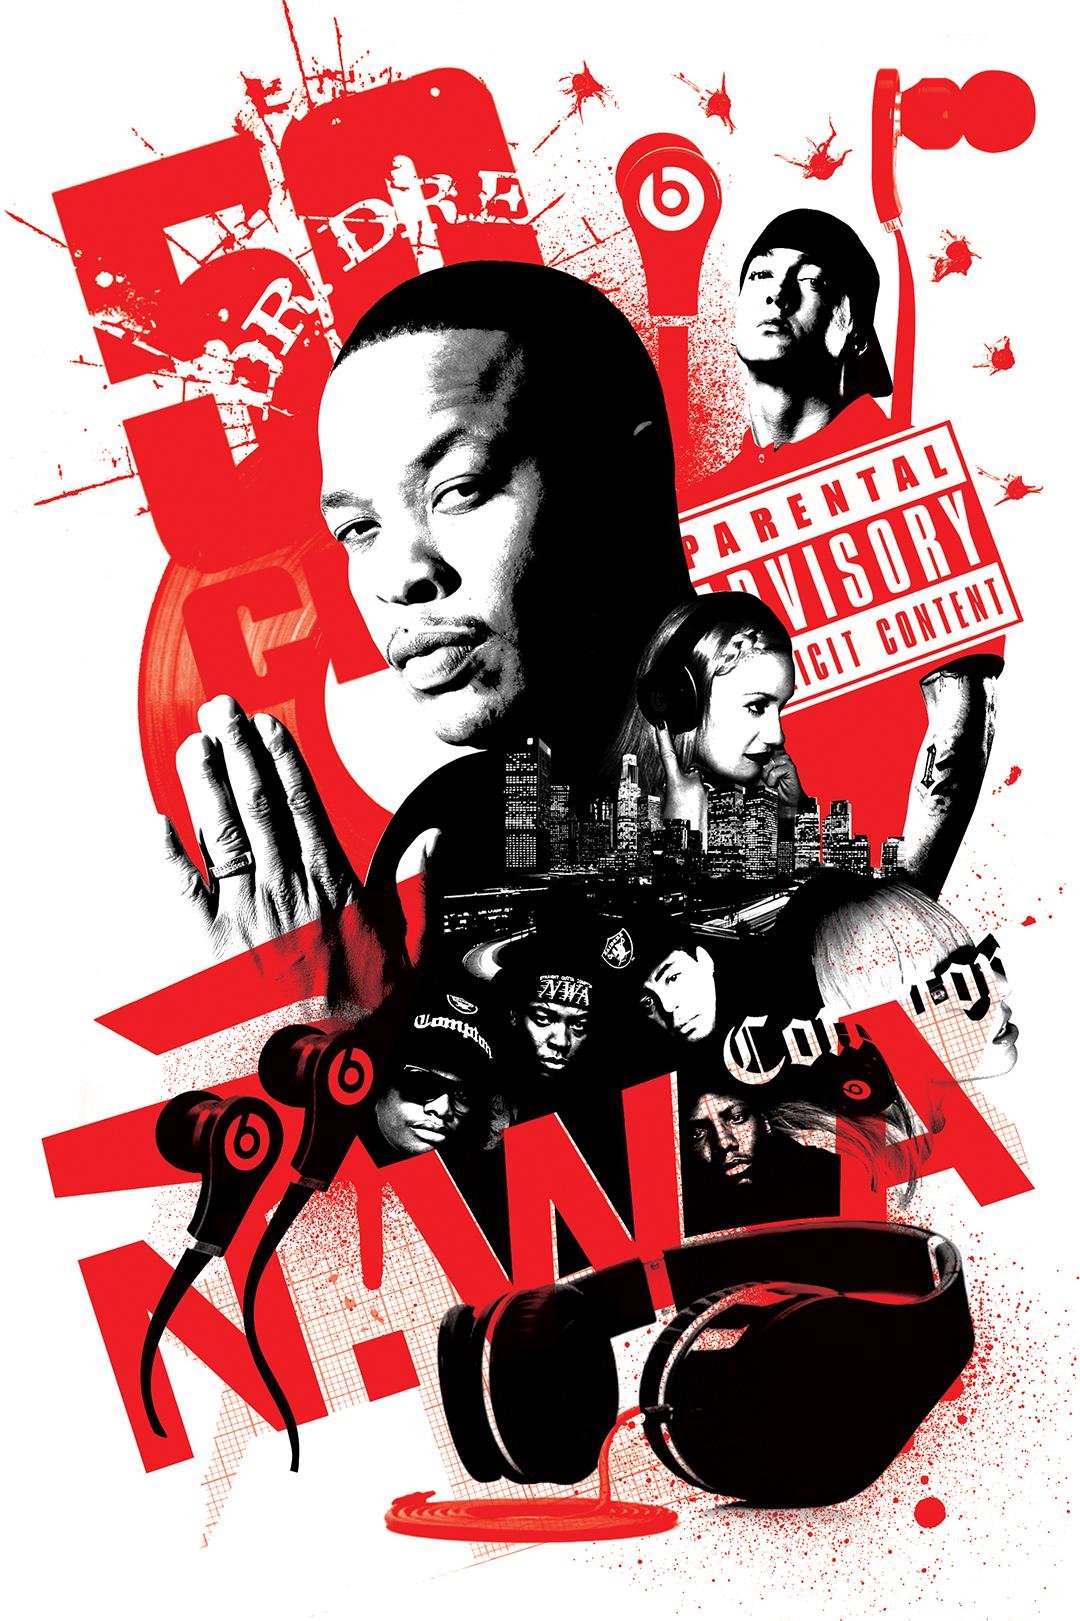 MD_Dre.jpg